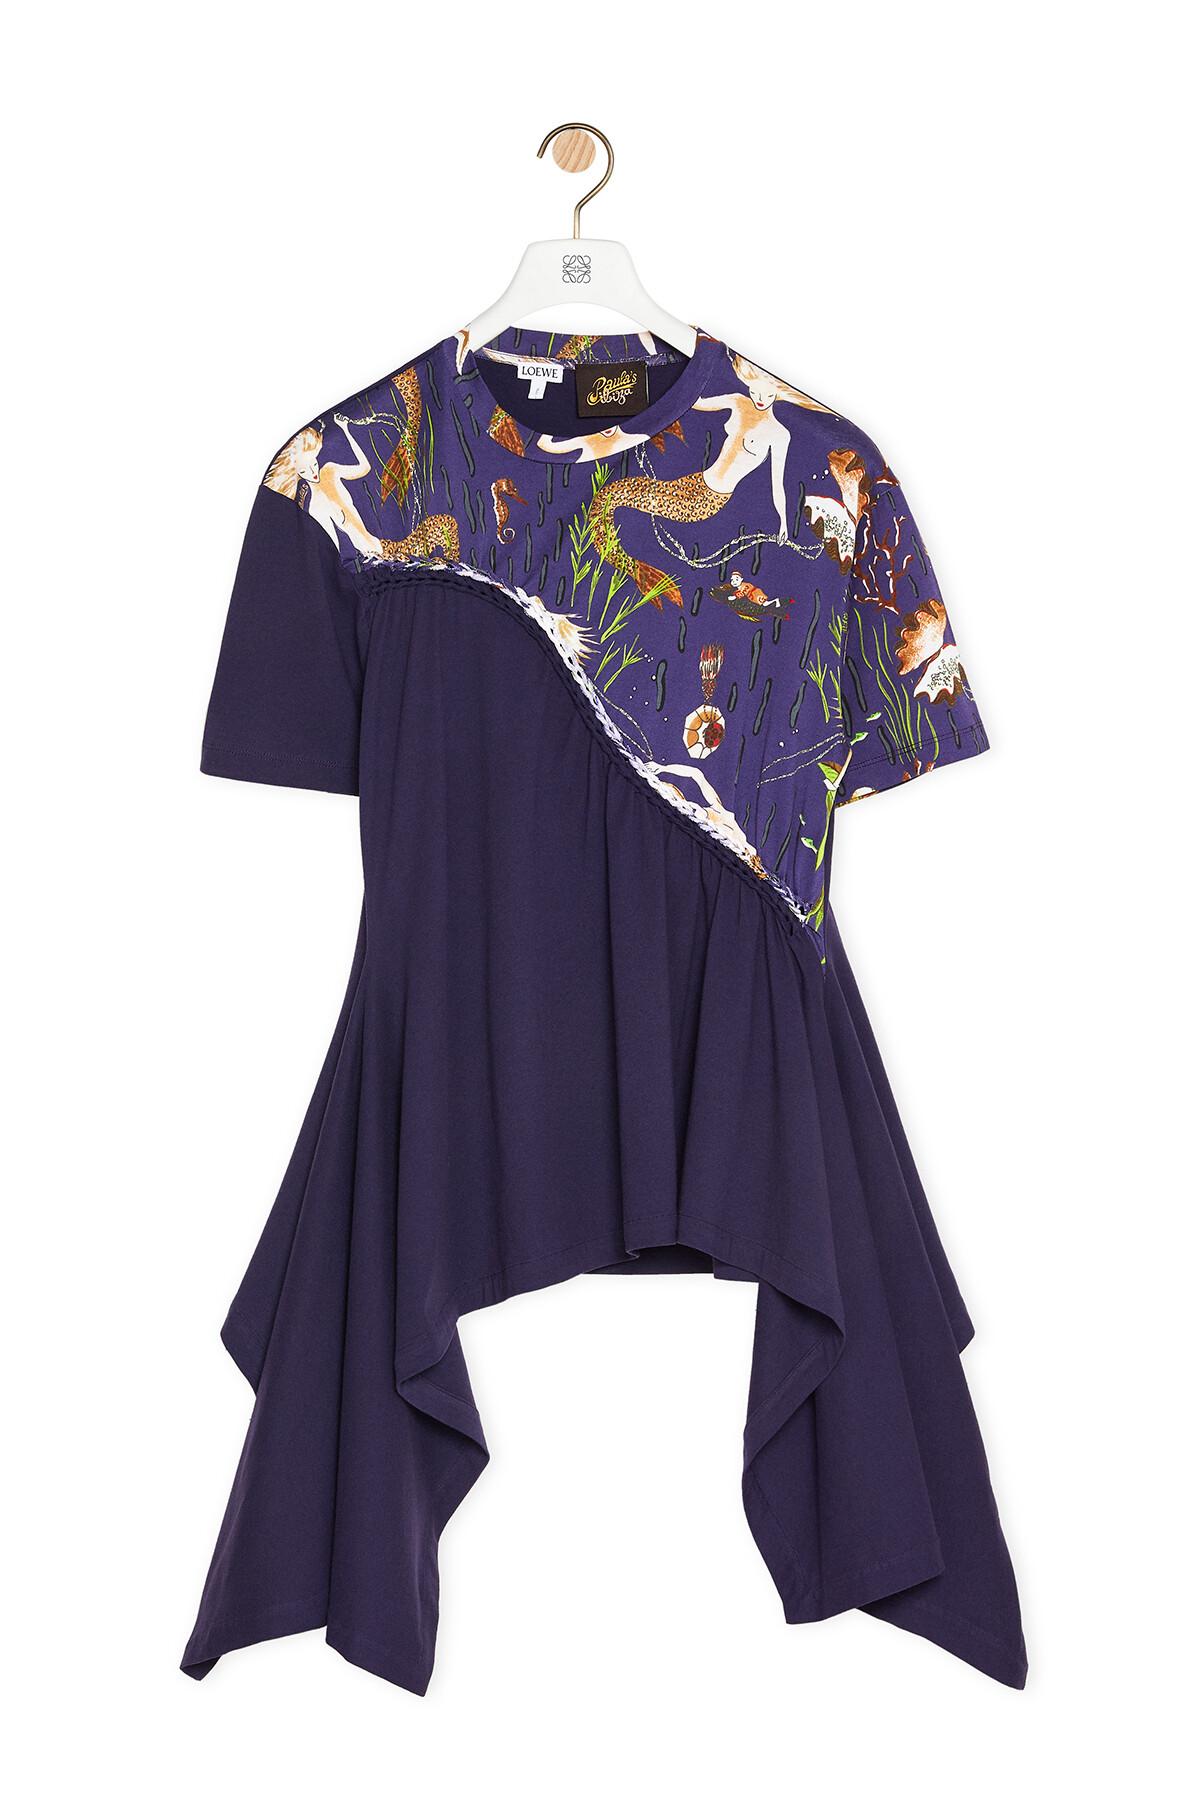 LOEWE Braided Asymmetrical T-Shirt In Mermaid Cotton Blue front